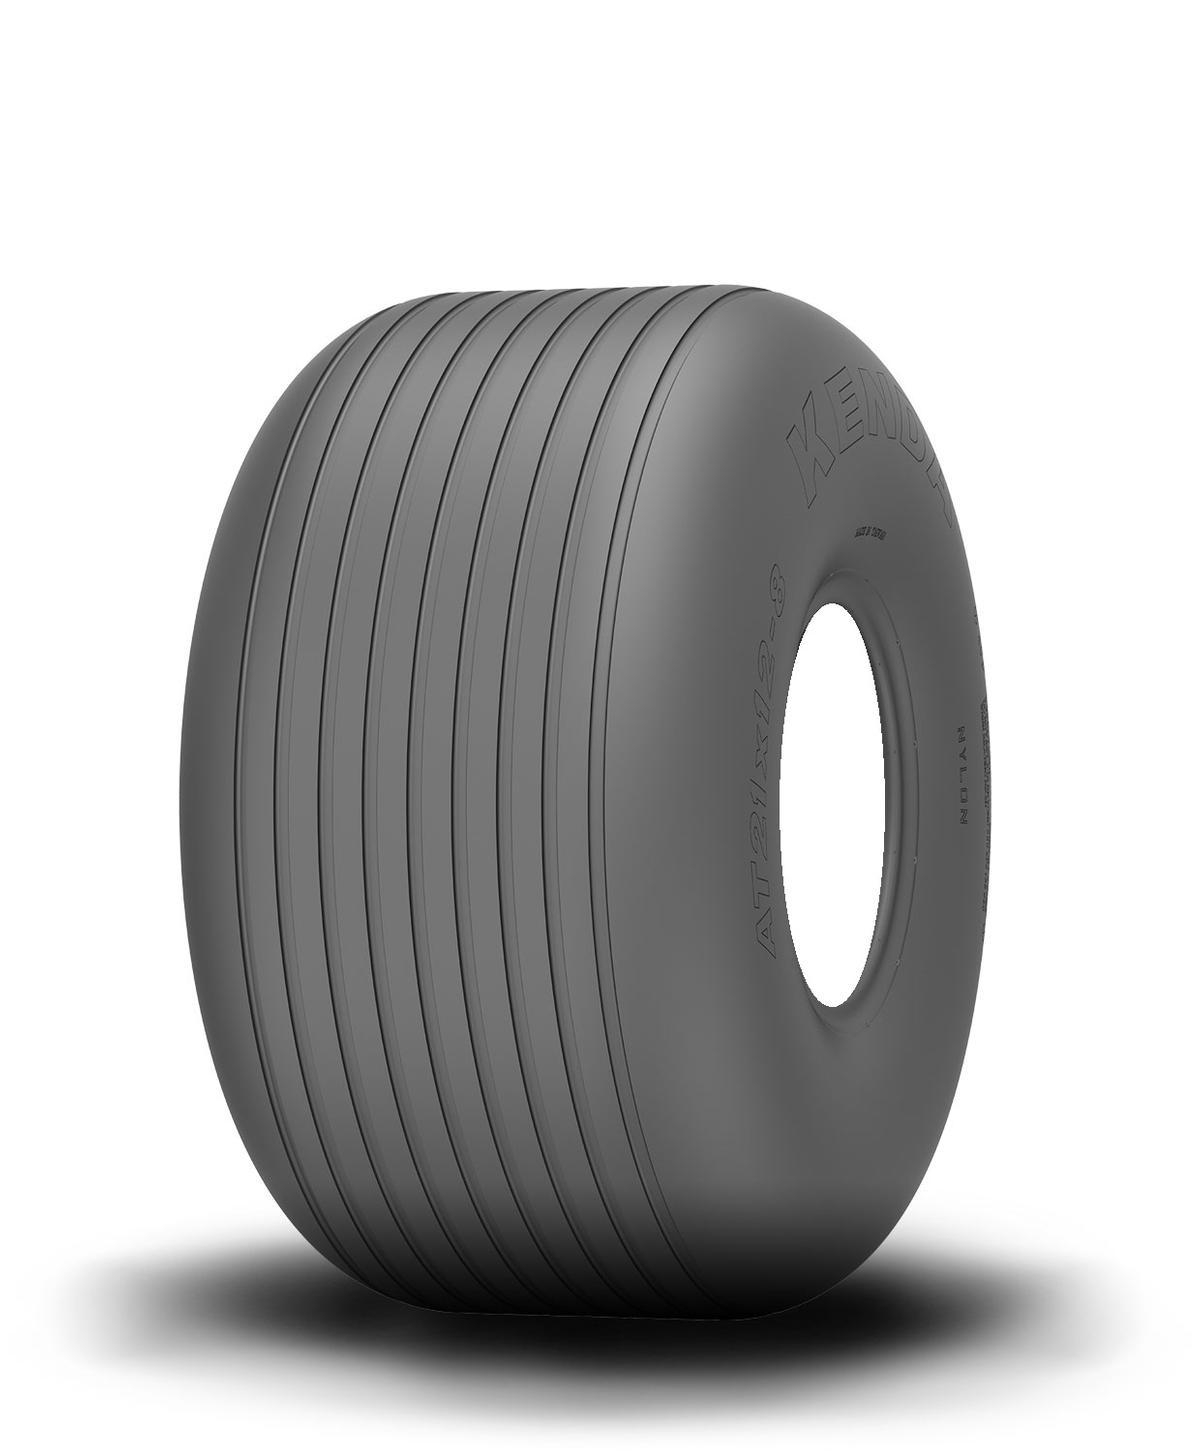 Kenda K401 Rib Implement Industrial - Ag Tires ($138.46 - $151.60)